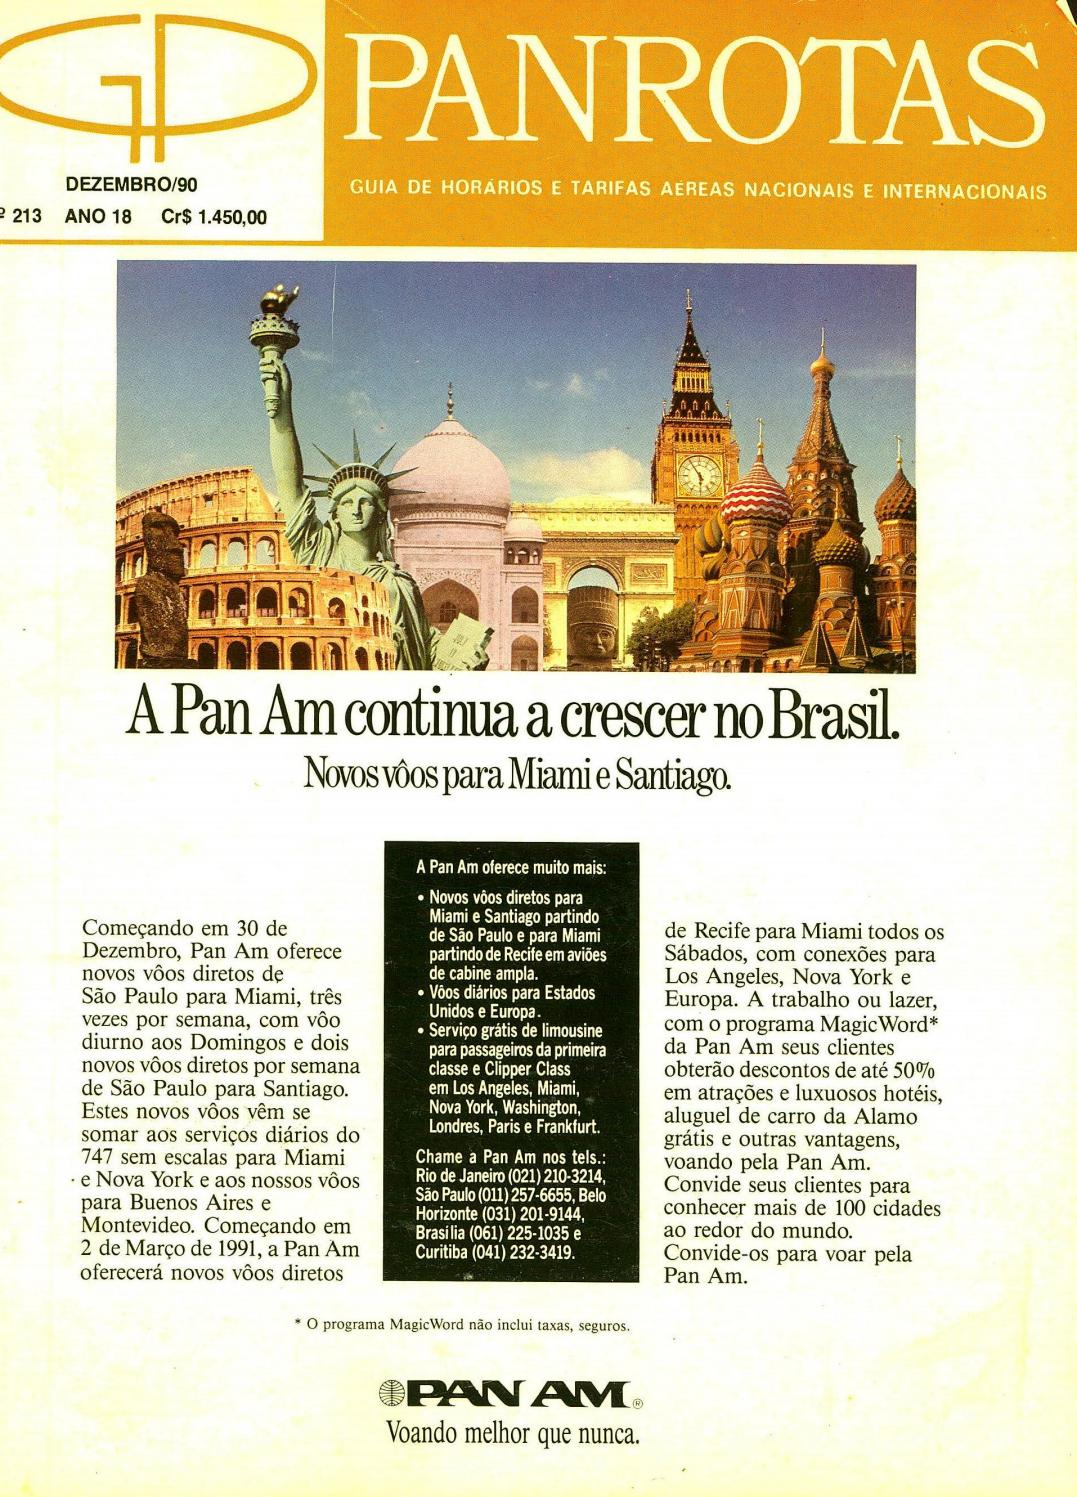 1723190b7 Guia PANROTAS - Edição 213 - Dezembro/1990 by PANROTAS Editora - issuu